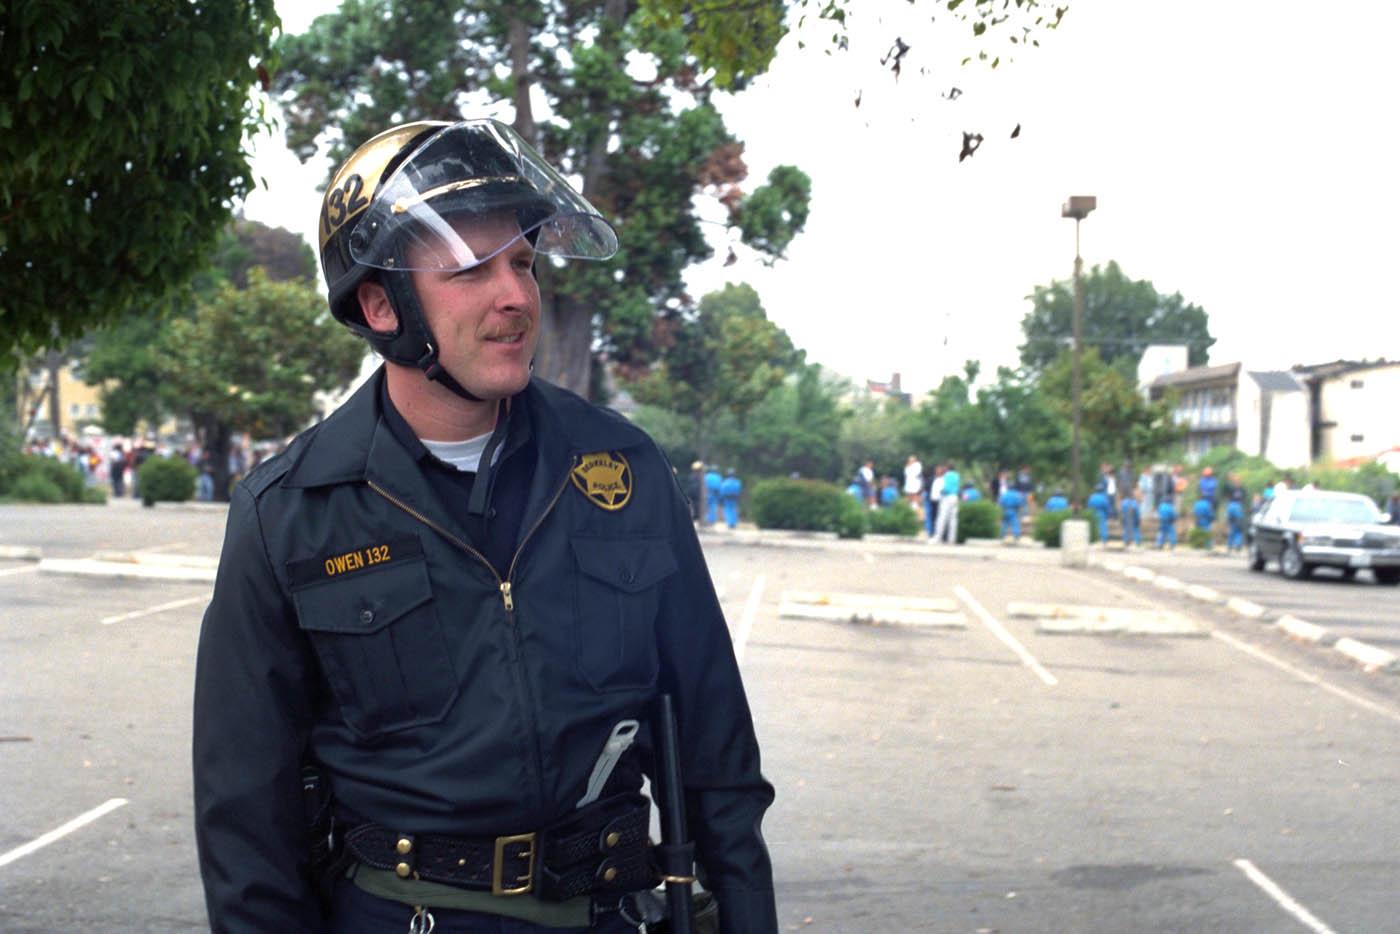 Officer Owen ,BPD, during the Berkeley People's Park riots, 1991.